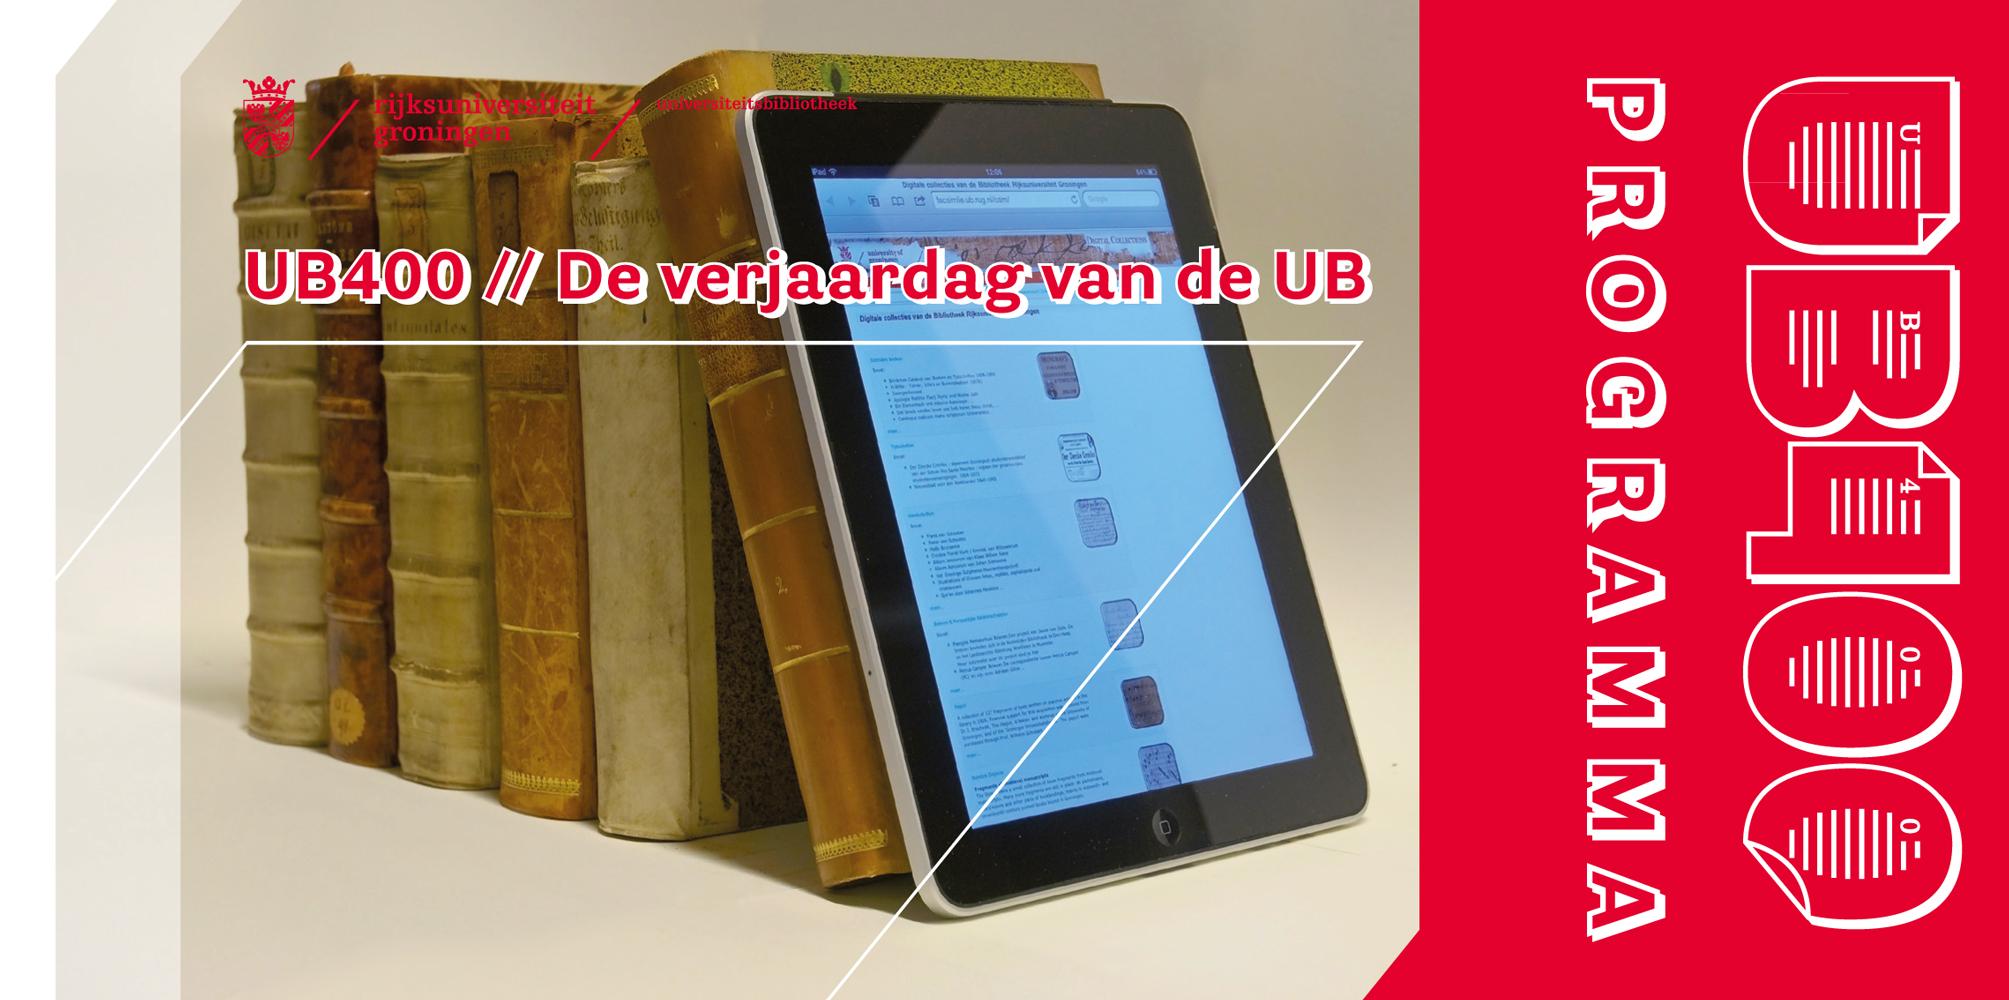 Programma-UB400-21032015